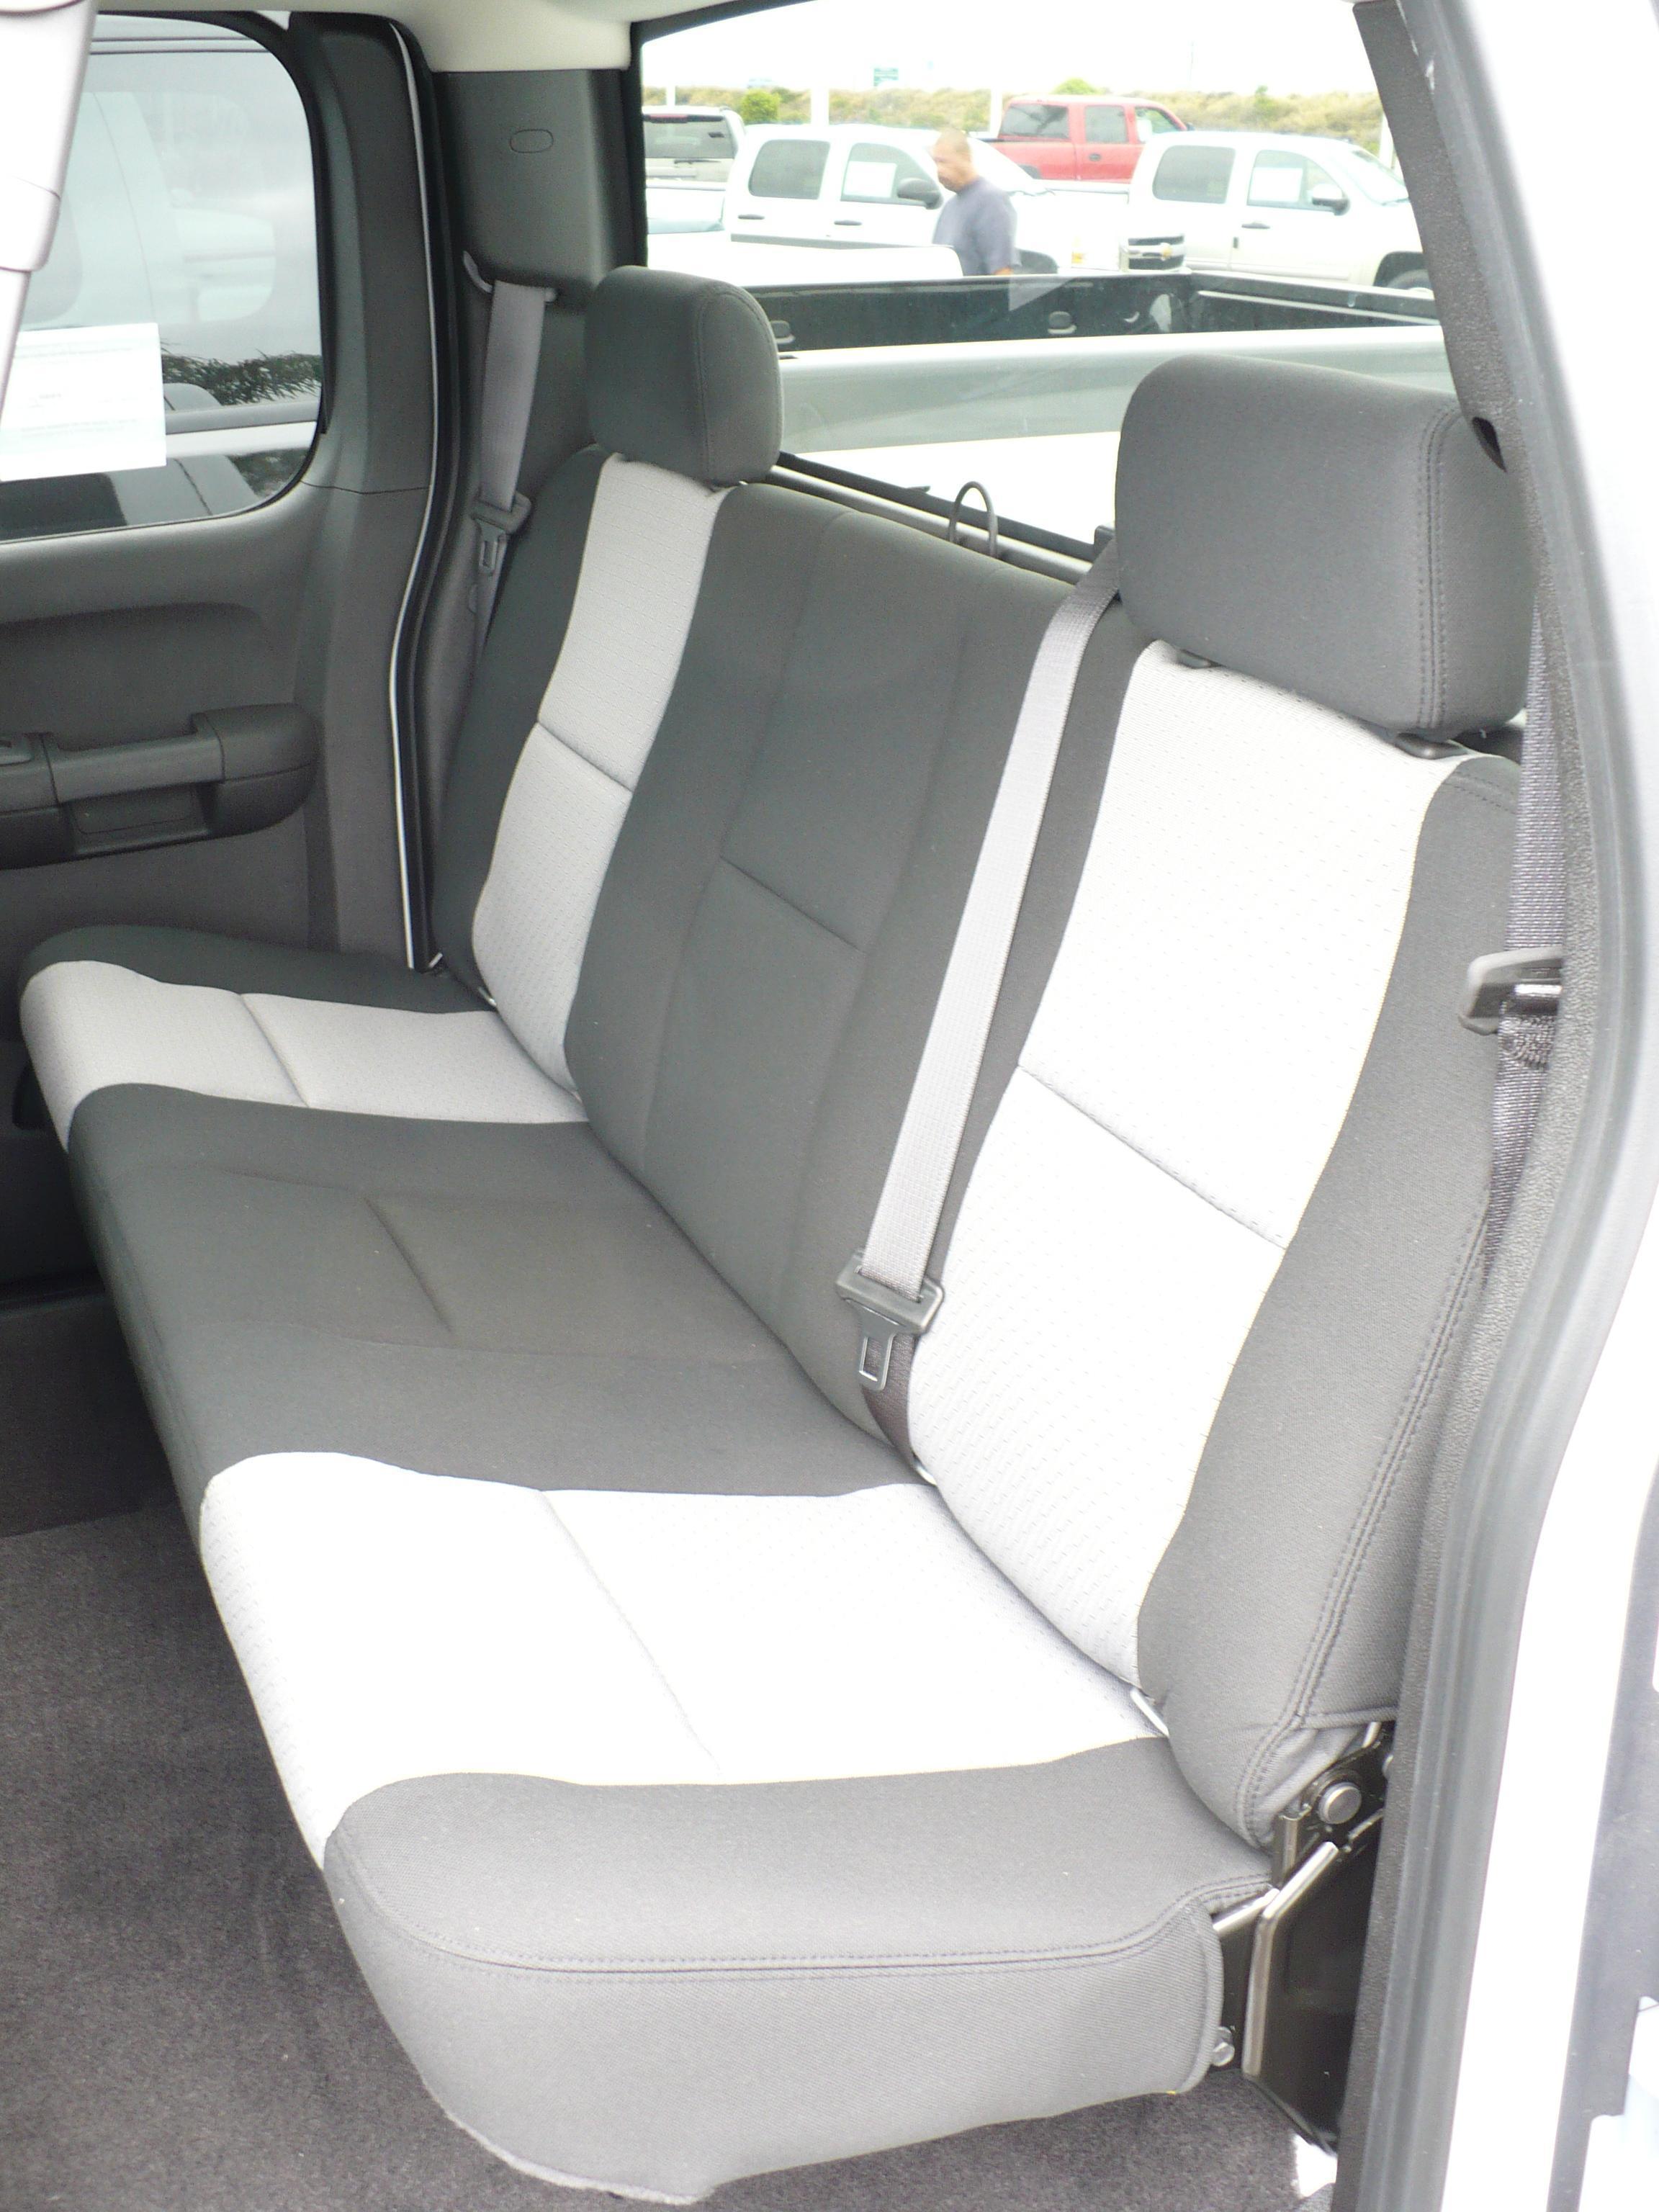 Camo Seat Covers For A 2013 Chevy Silverado  Autos Post